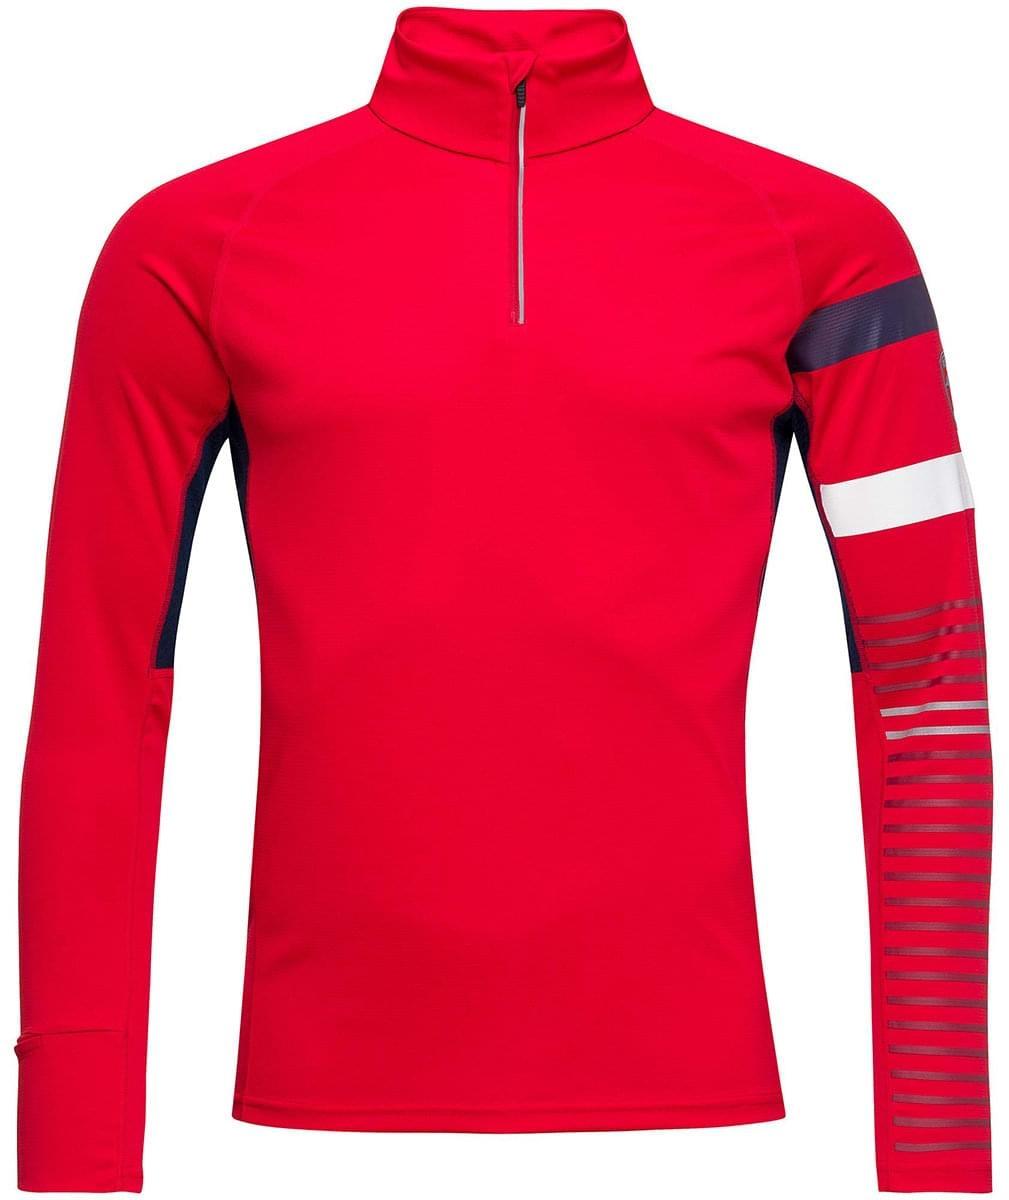 Rossignol Poursuite 1/2 Zip - sport red L